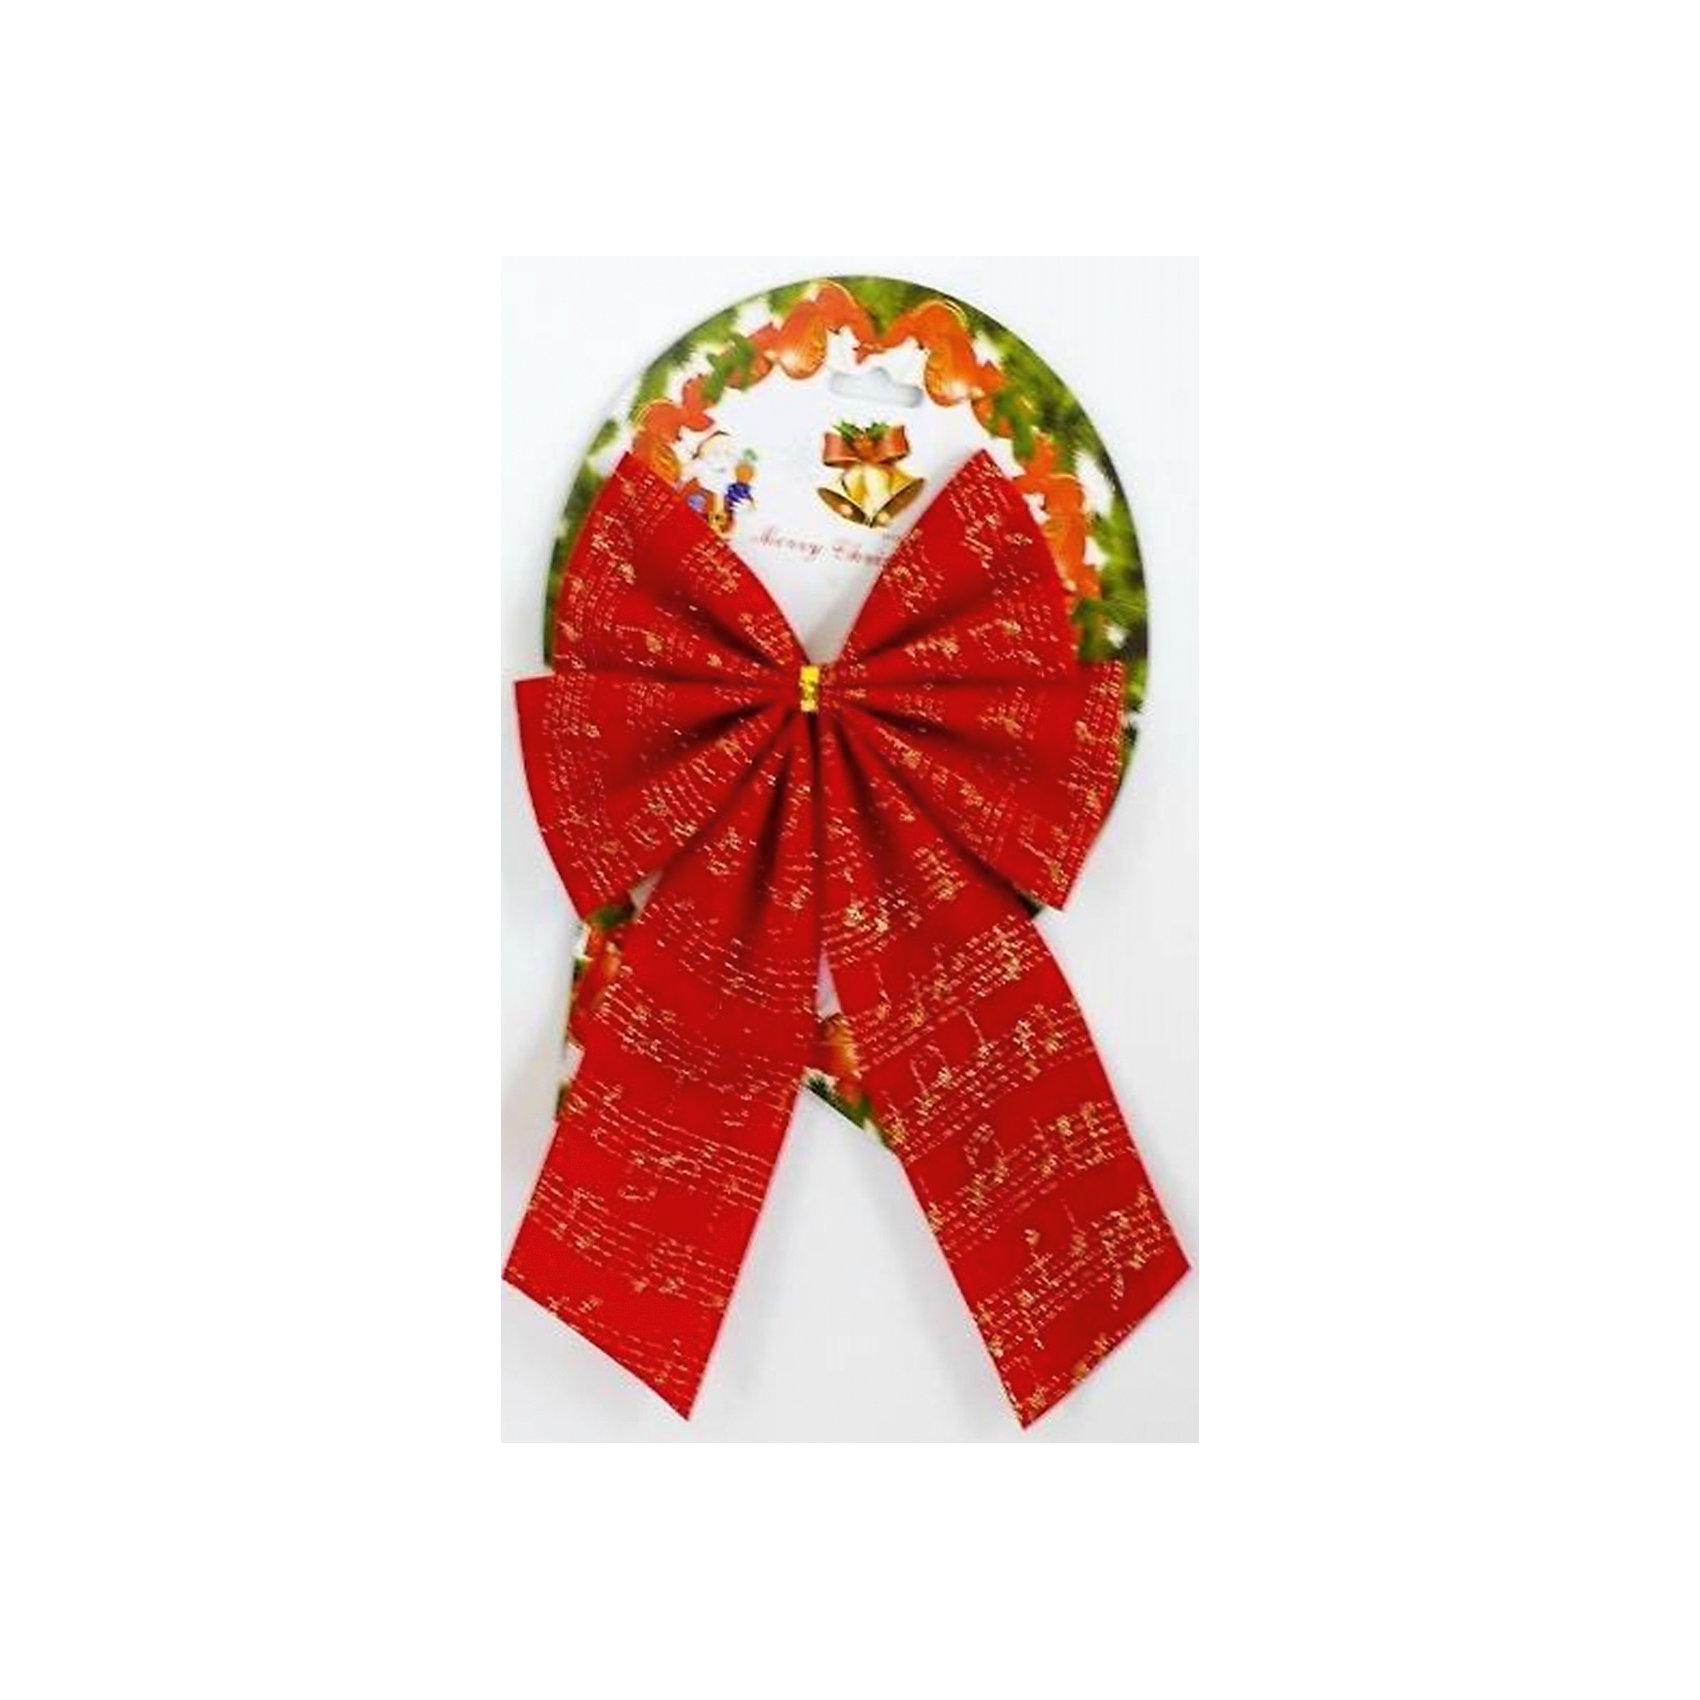 Украшение Красный бант с нотамиВсё для праздника<br>Украшение новогоднее БАНТ Красный с нотами арт.42779 / 17х21<br><br>Ширина мм: 170<br>Глубина мм: 210<br>Высота мм: 5<br>Вес г: 30<br>Возраст от месяцев: 60<br>Возраст до месяцев: 600<br>Пол: Унисекс<br>Возраст: Детский<br>SKU: 5144592